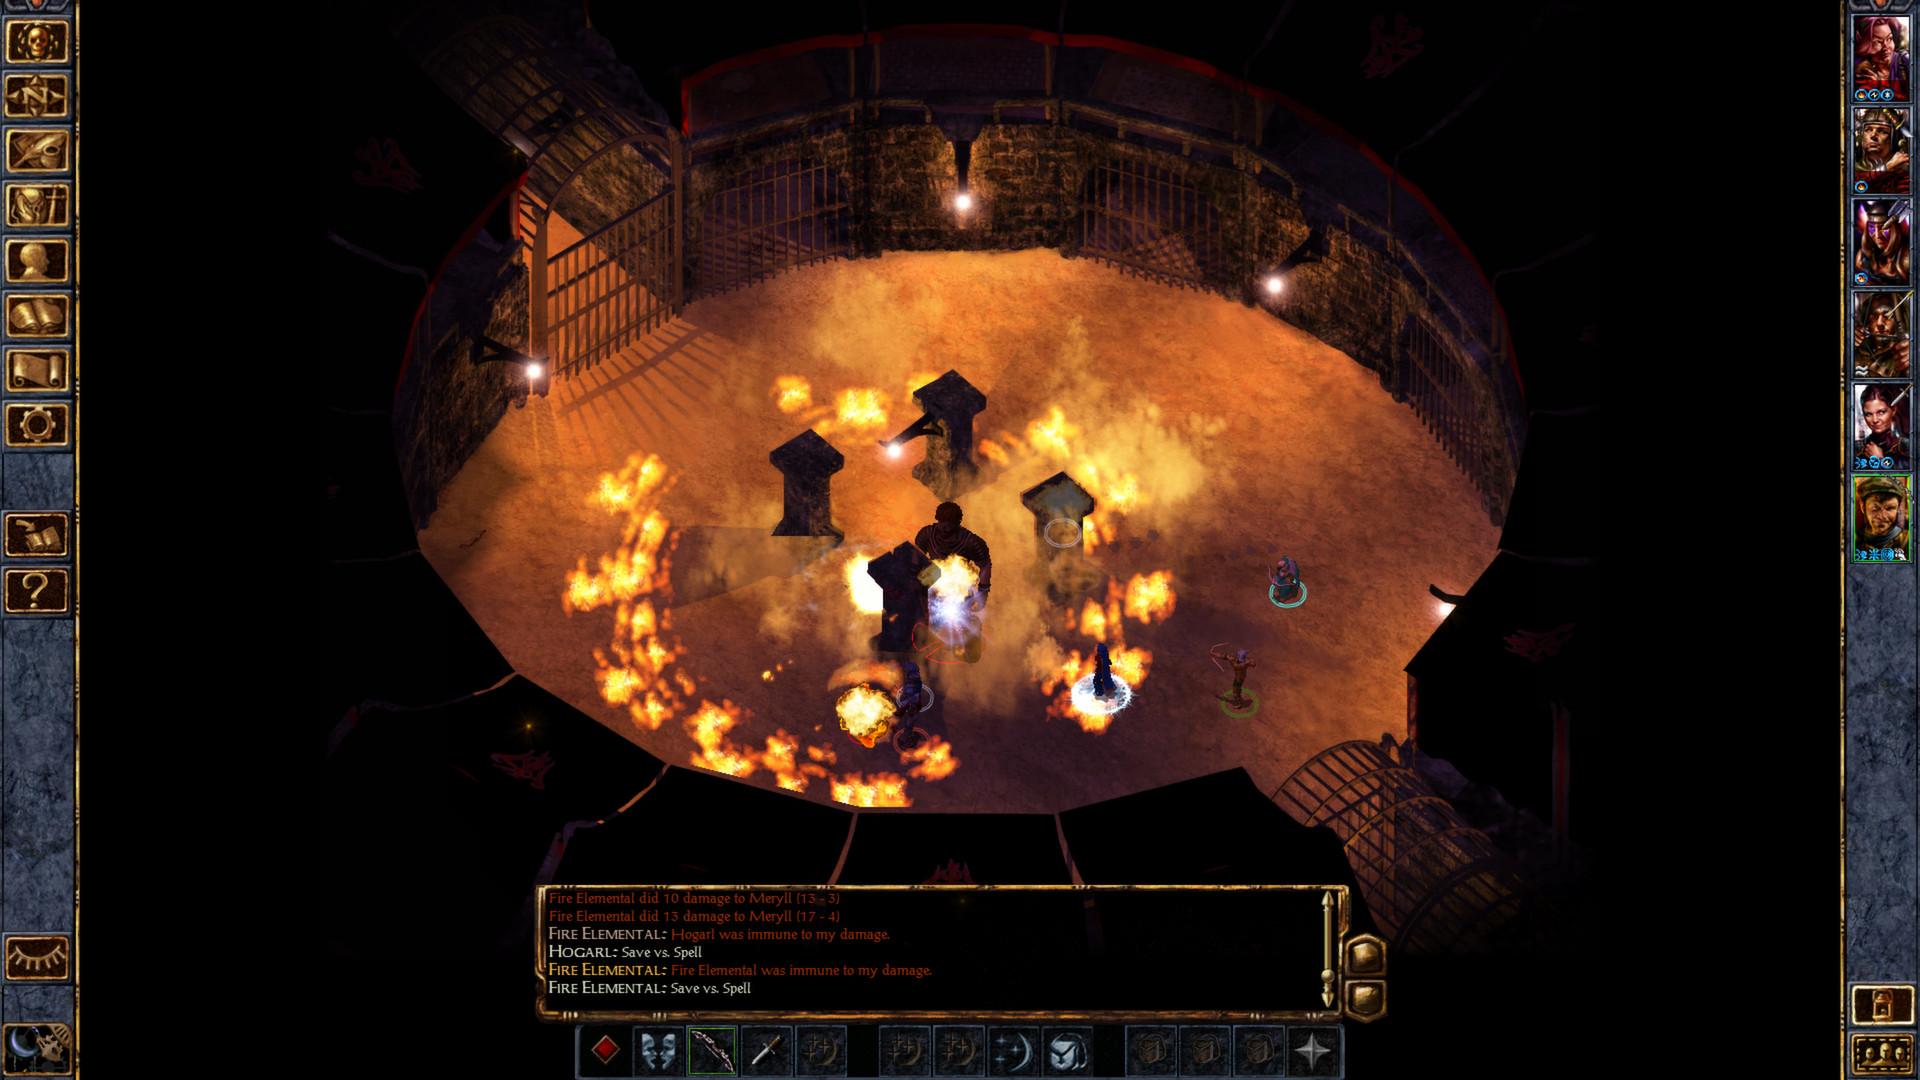 CRPG玩家盛宴 《博德之门》《无冬之夜》经典游戏Steam打折中